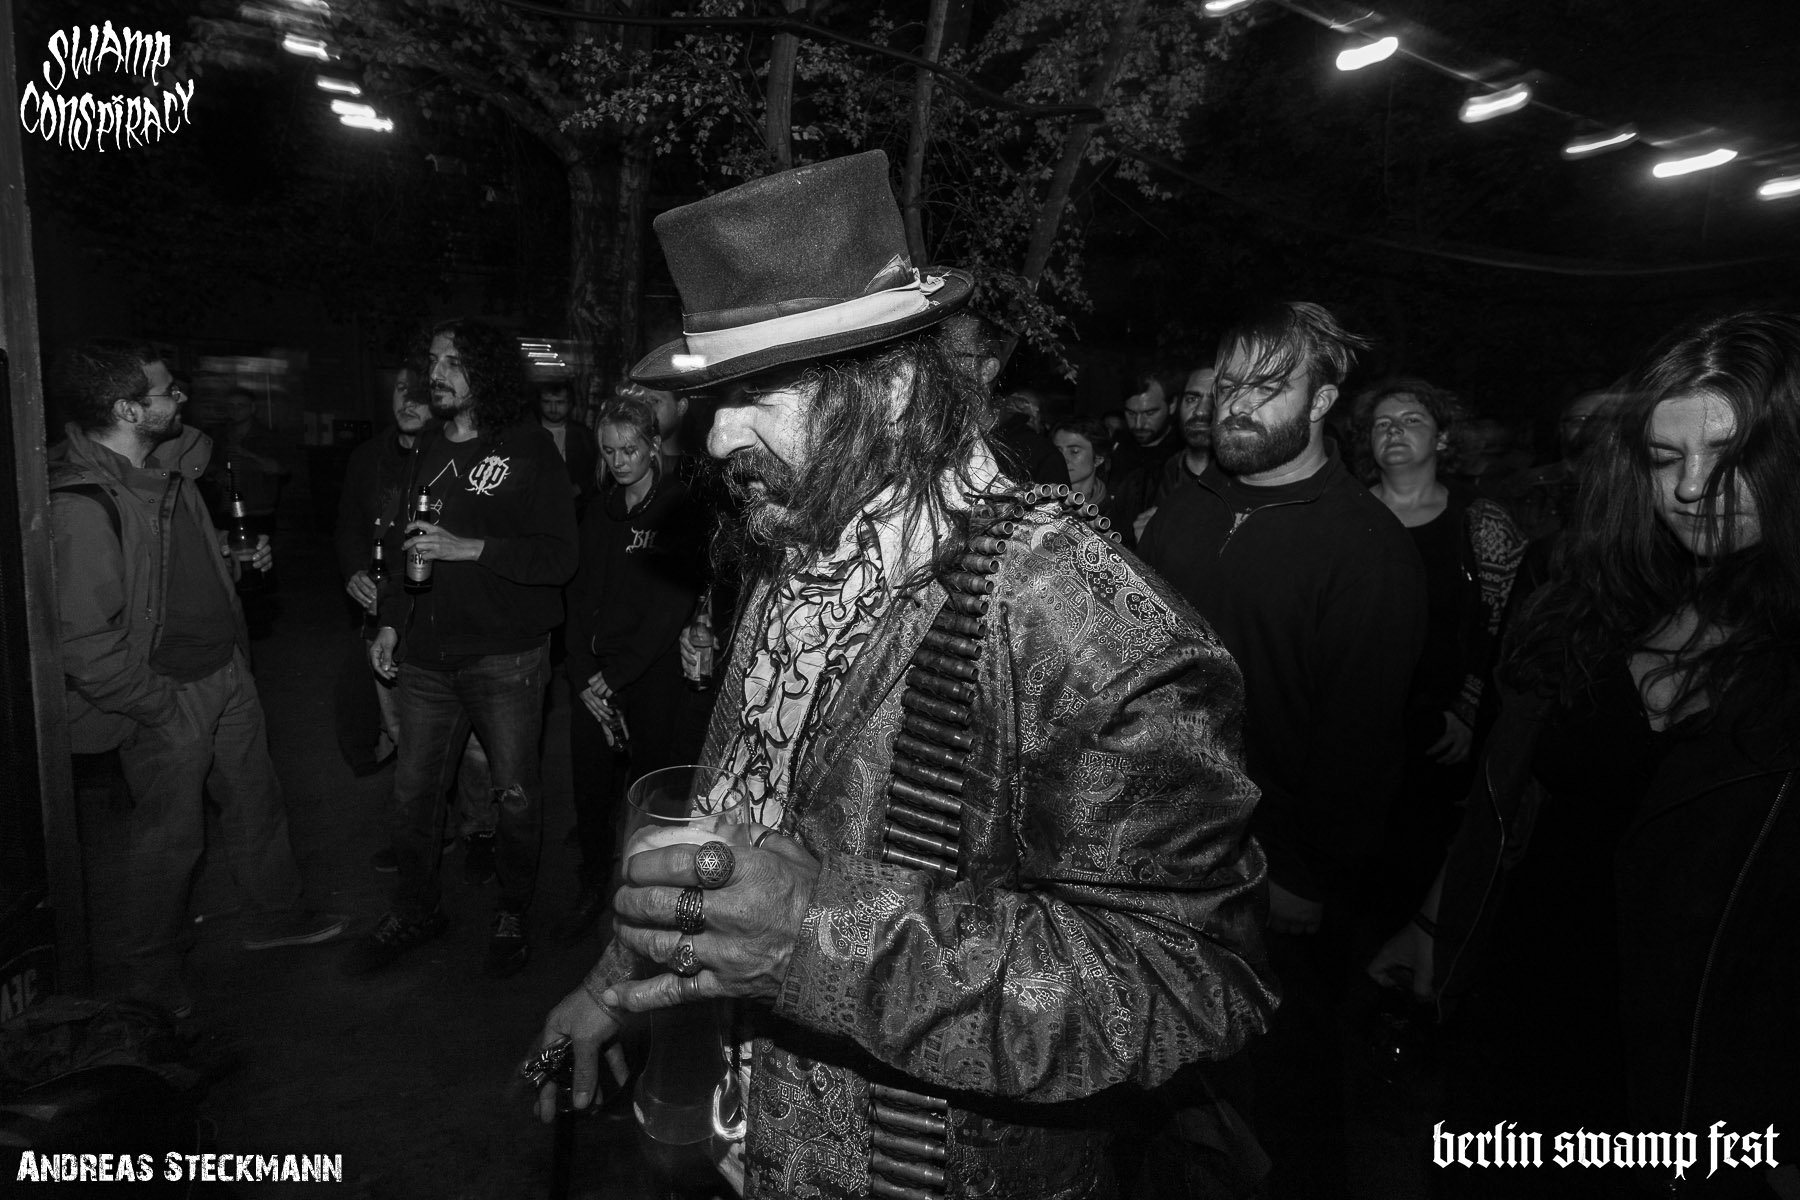 Cannabineros_Berlin_Swamp_Fest_2019_6